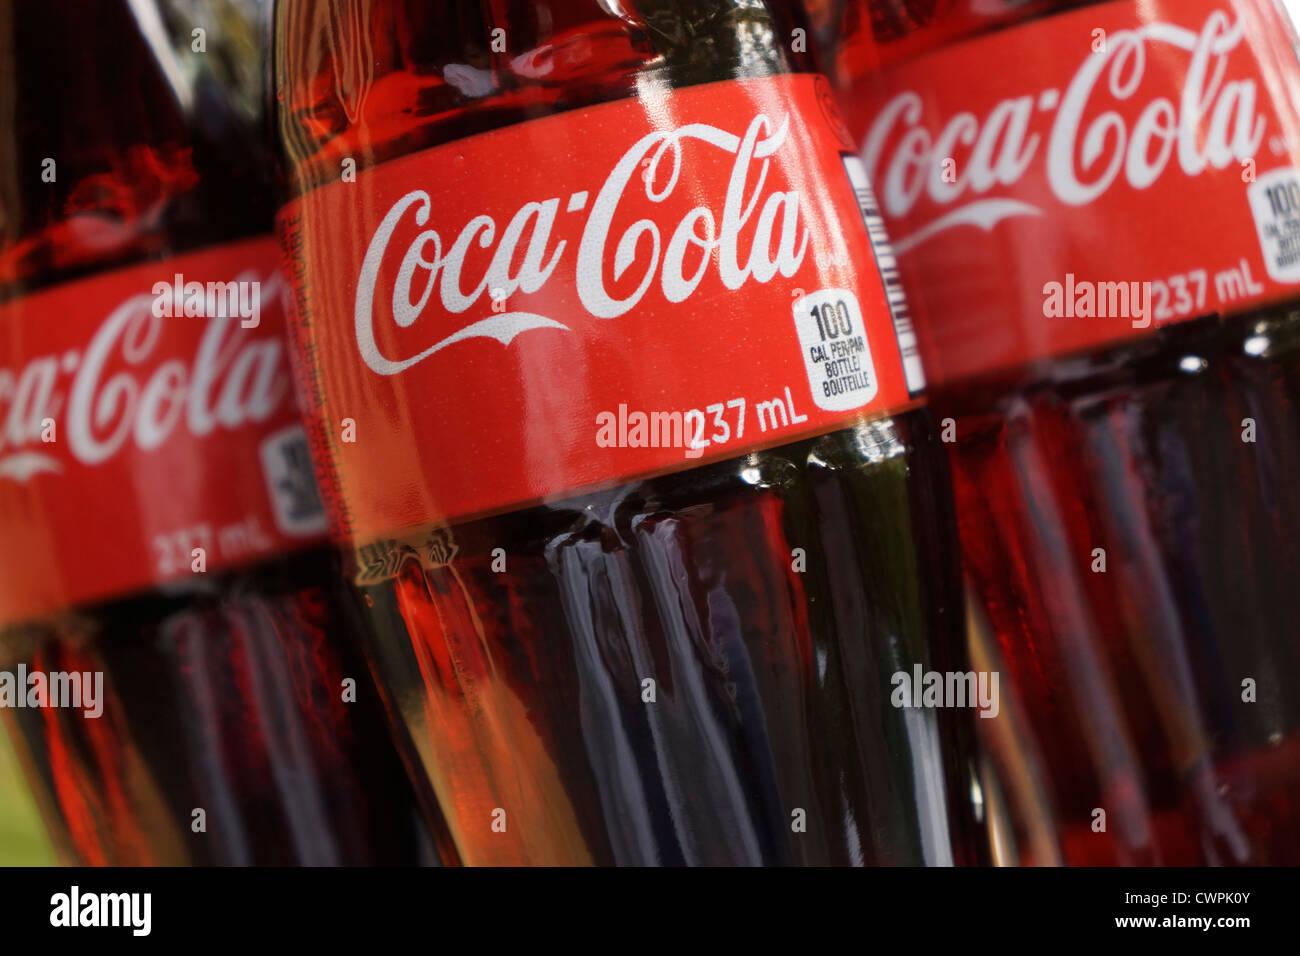 Coca Cola Bottles - Stock Image